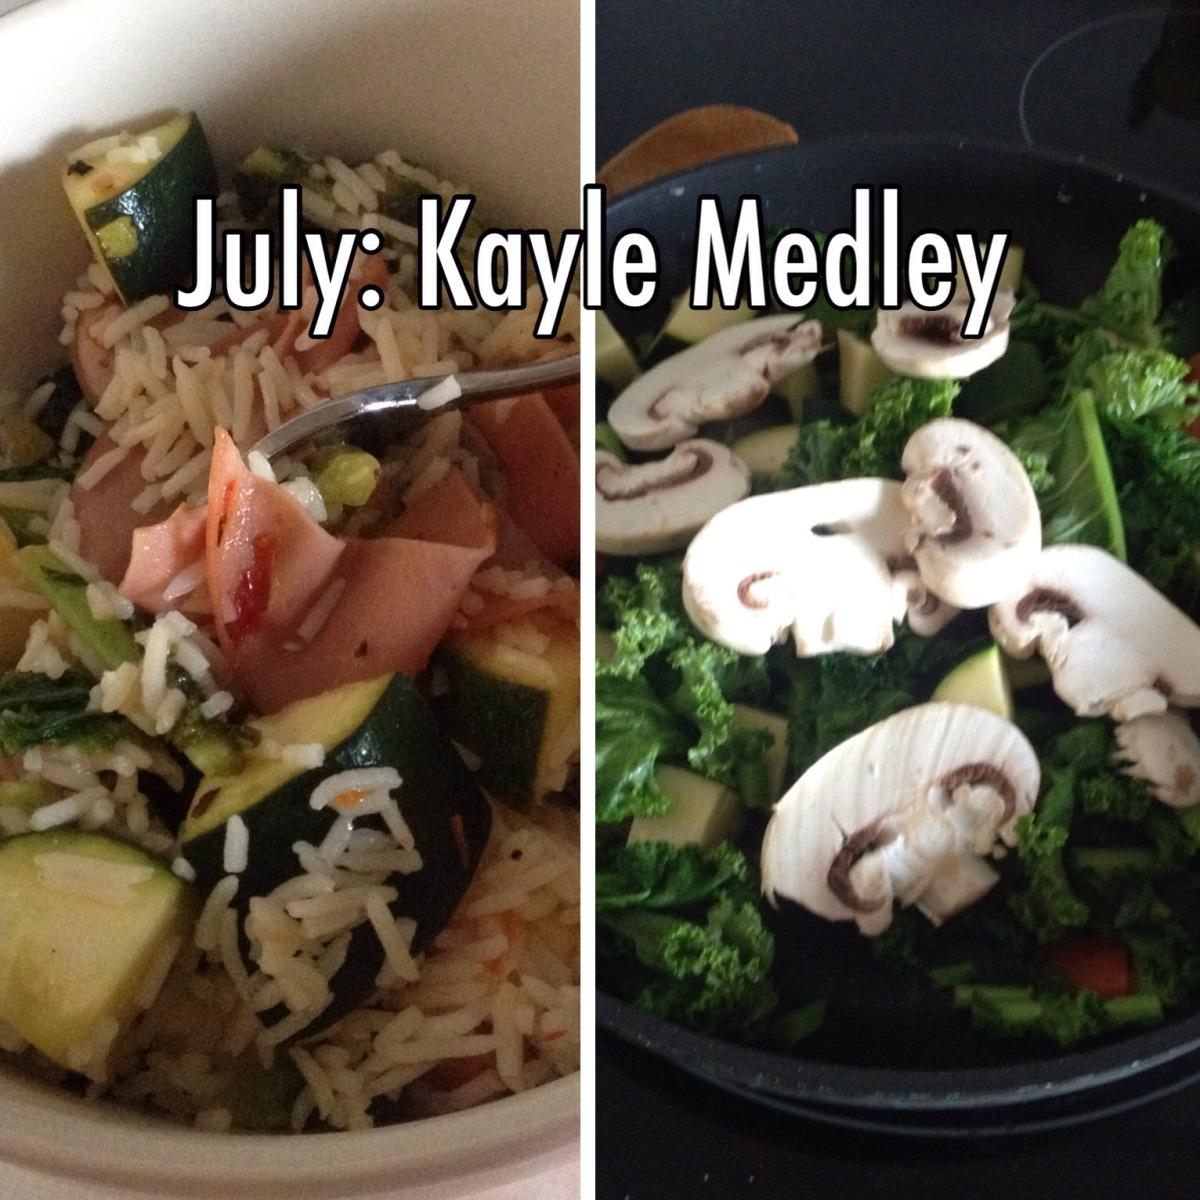 July: Kale Medley